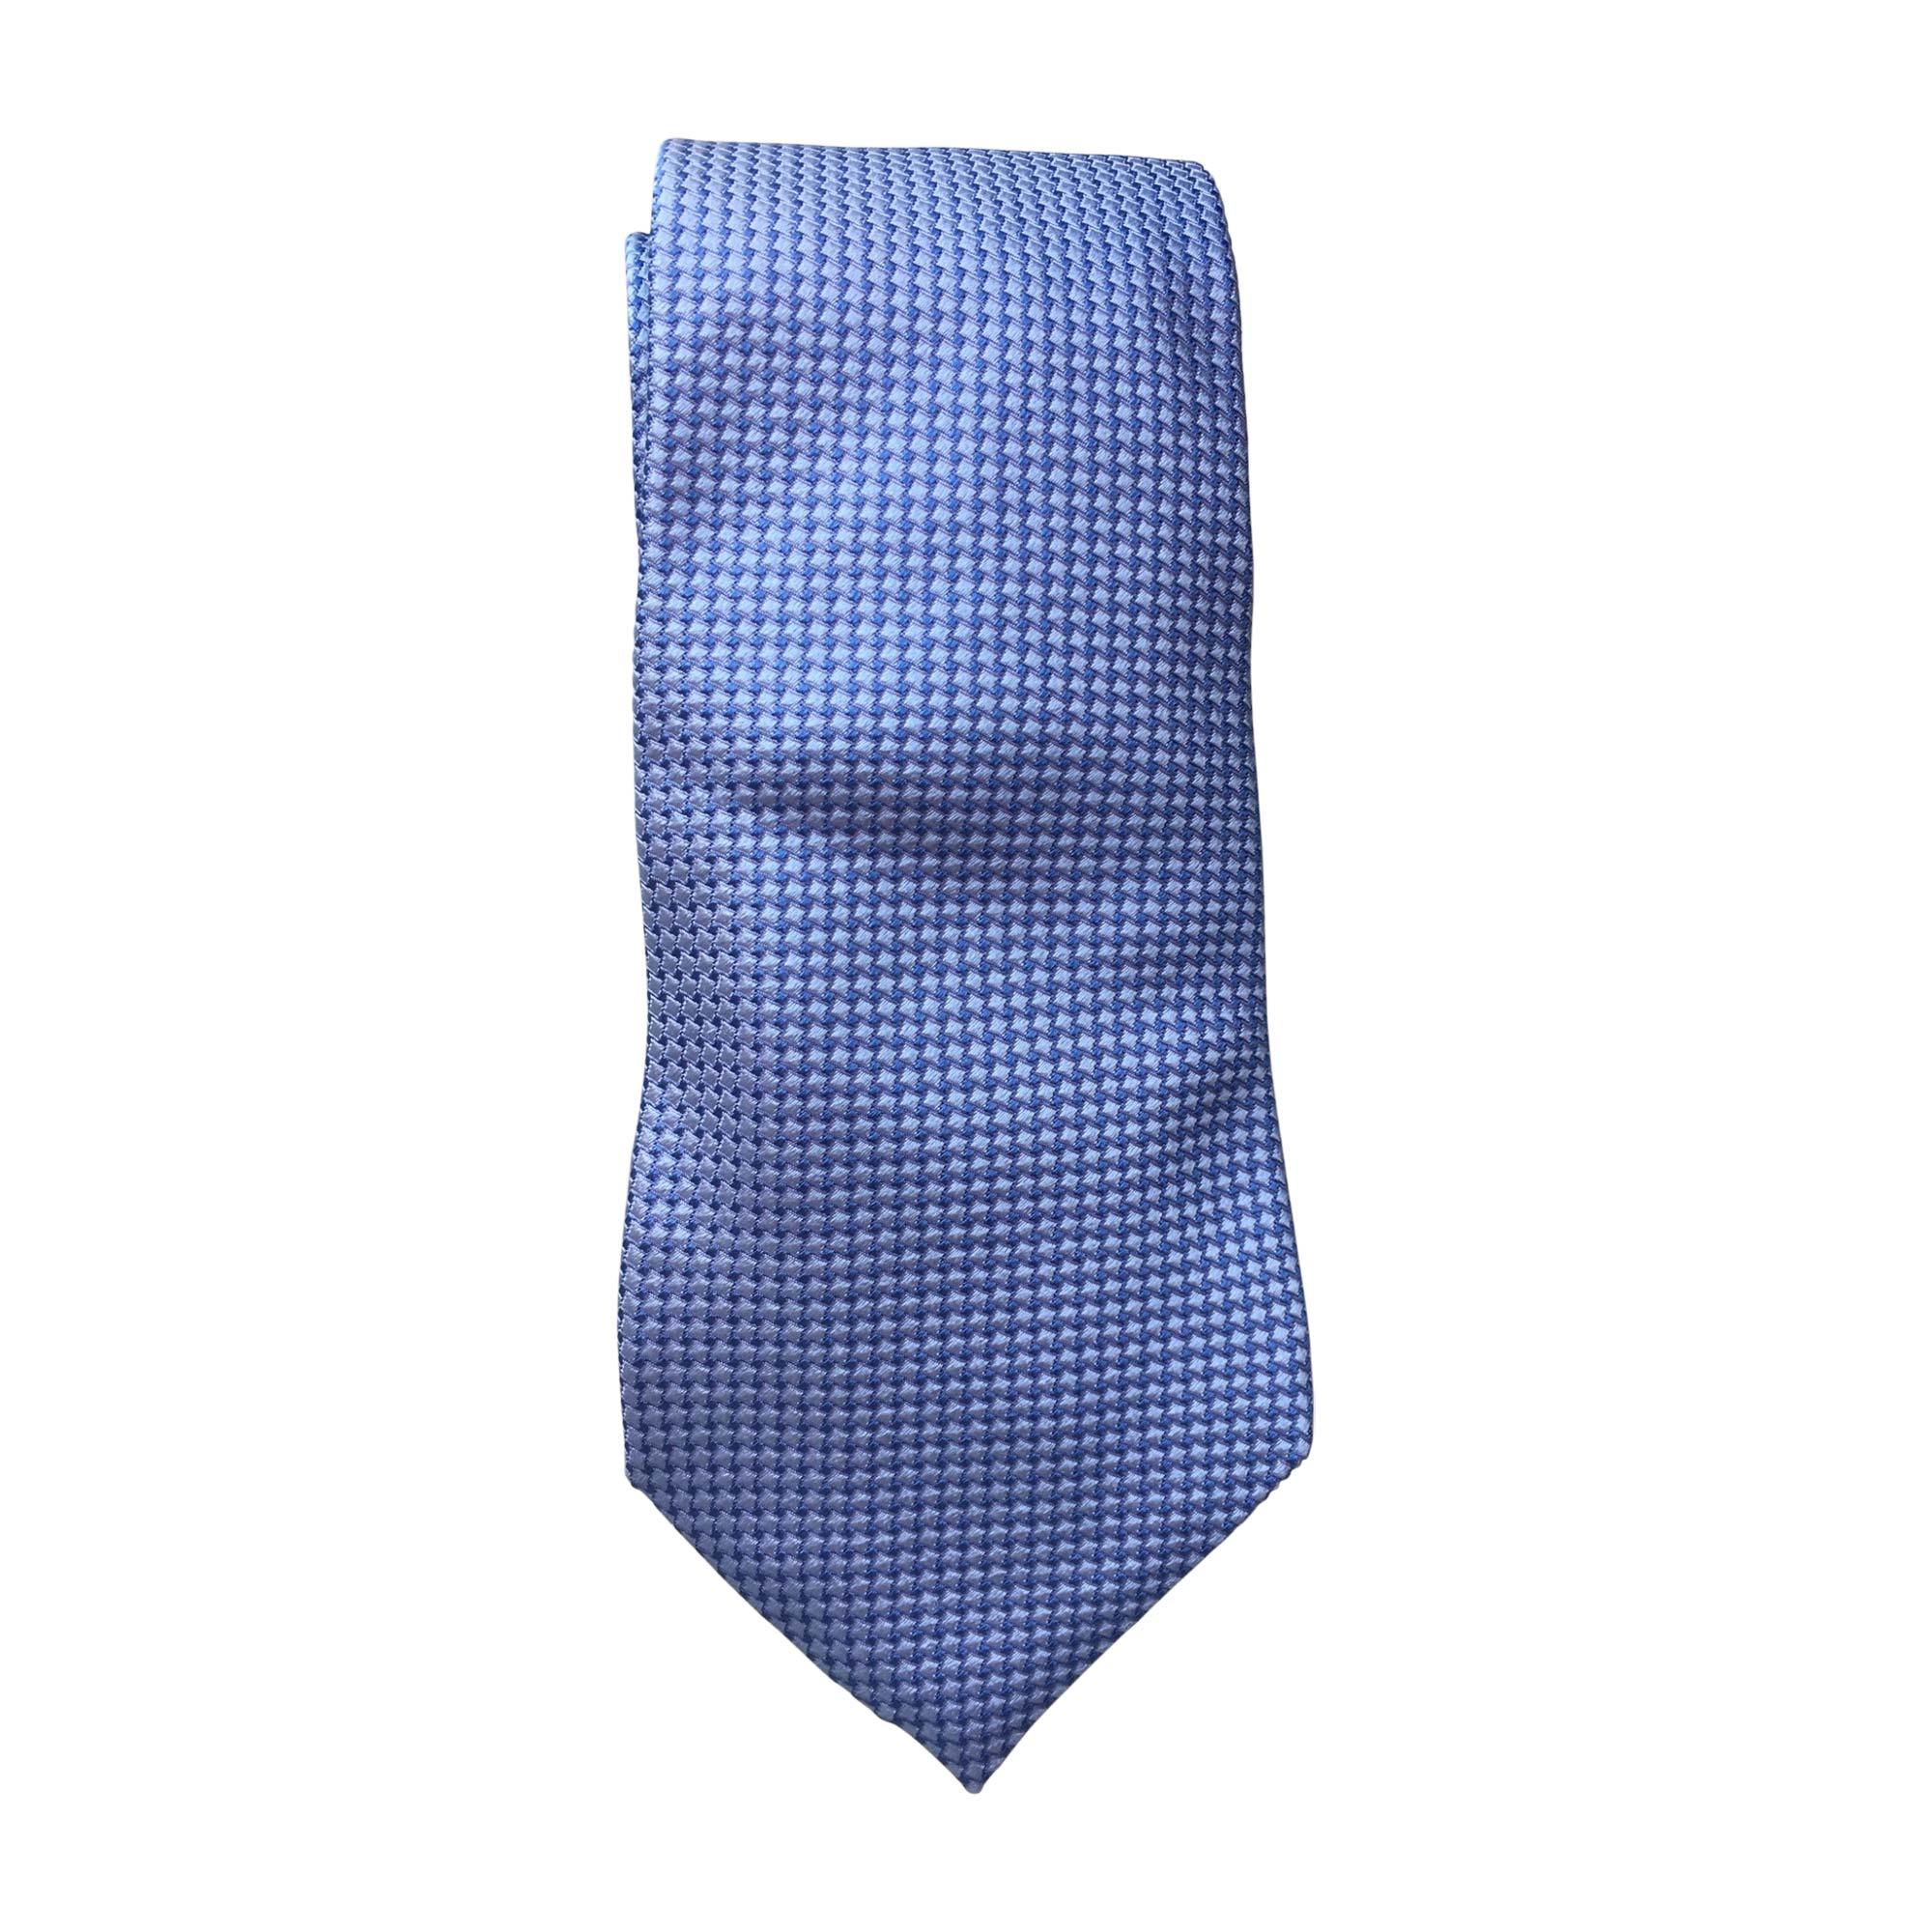 Tie GIORGIO ARMANI Blue, navy, turquoise